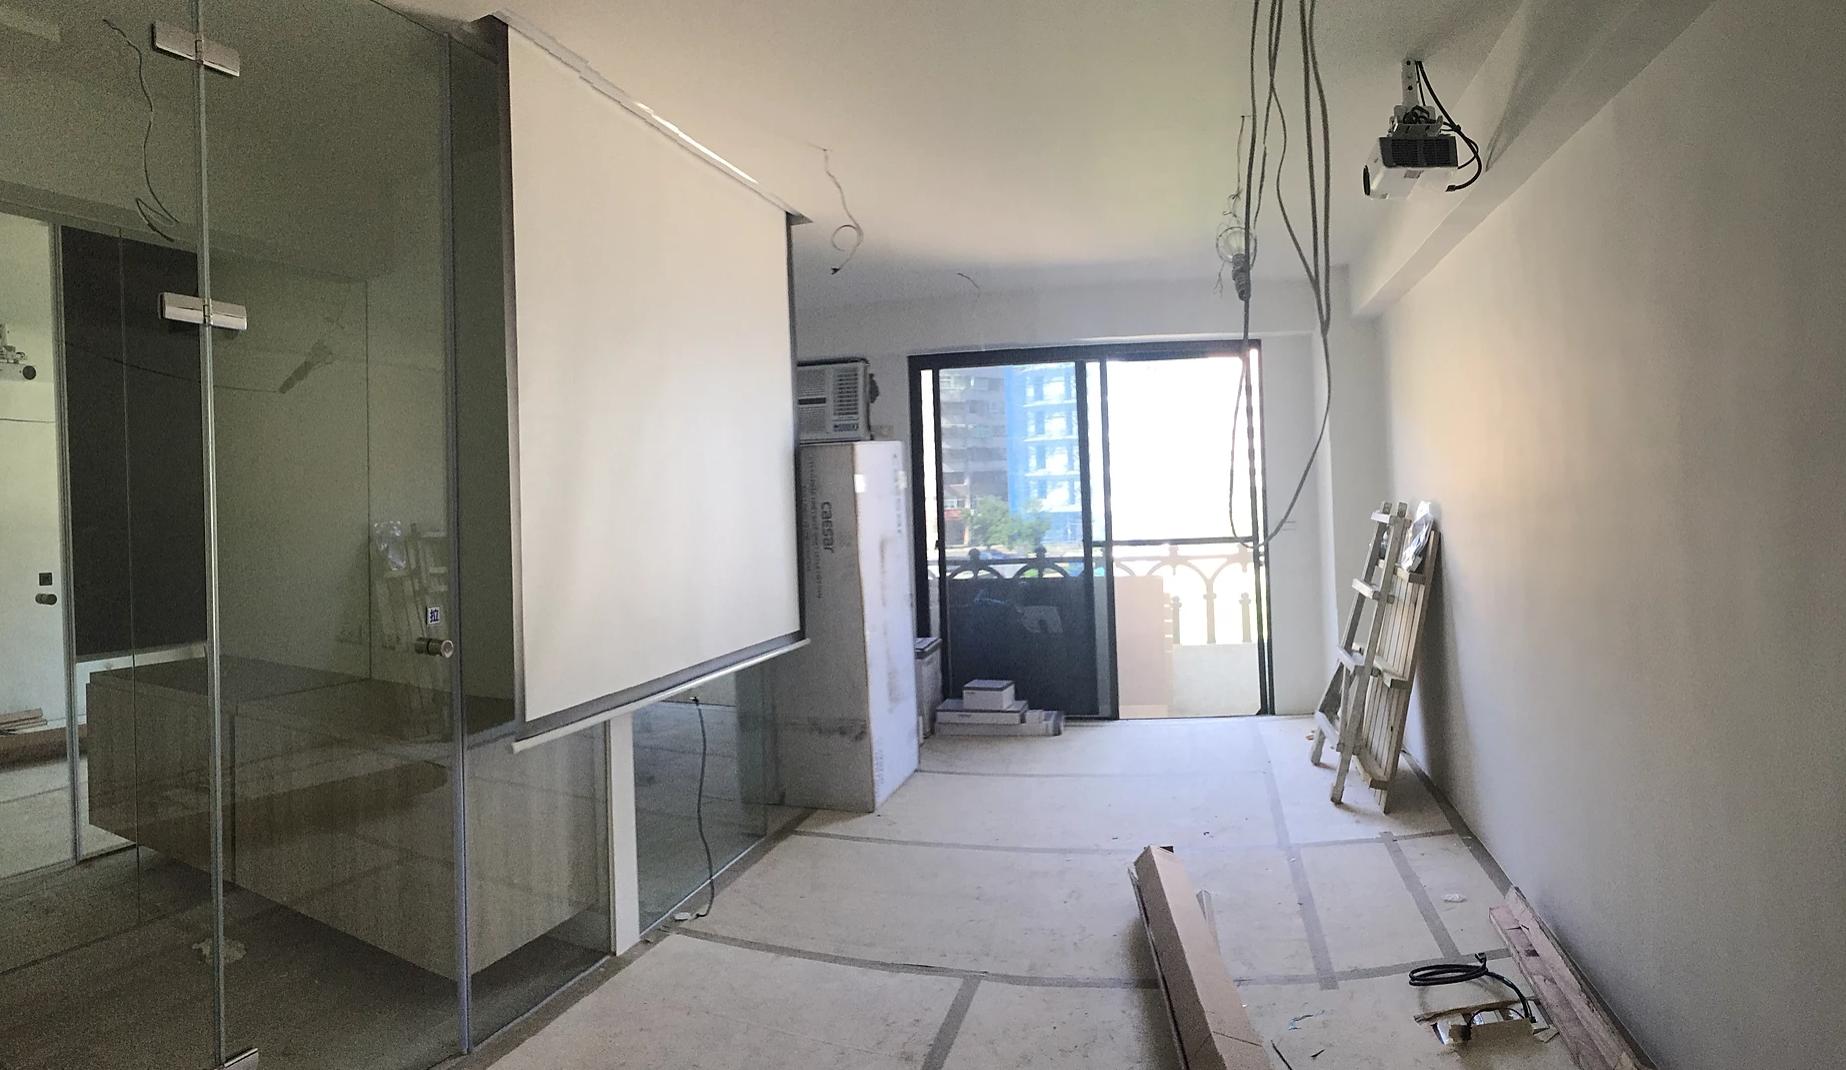 德築-DEZU-project-礁溪套房裝修-architecture-interior-renovation-6